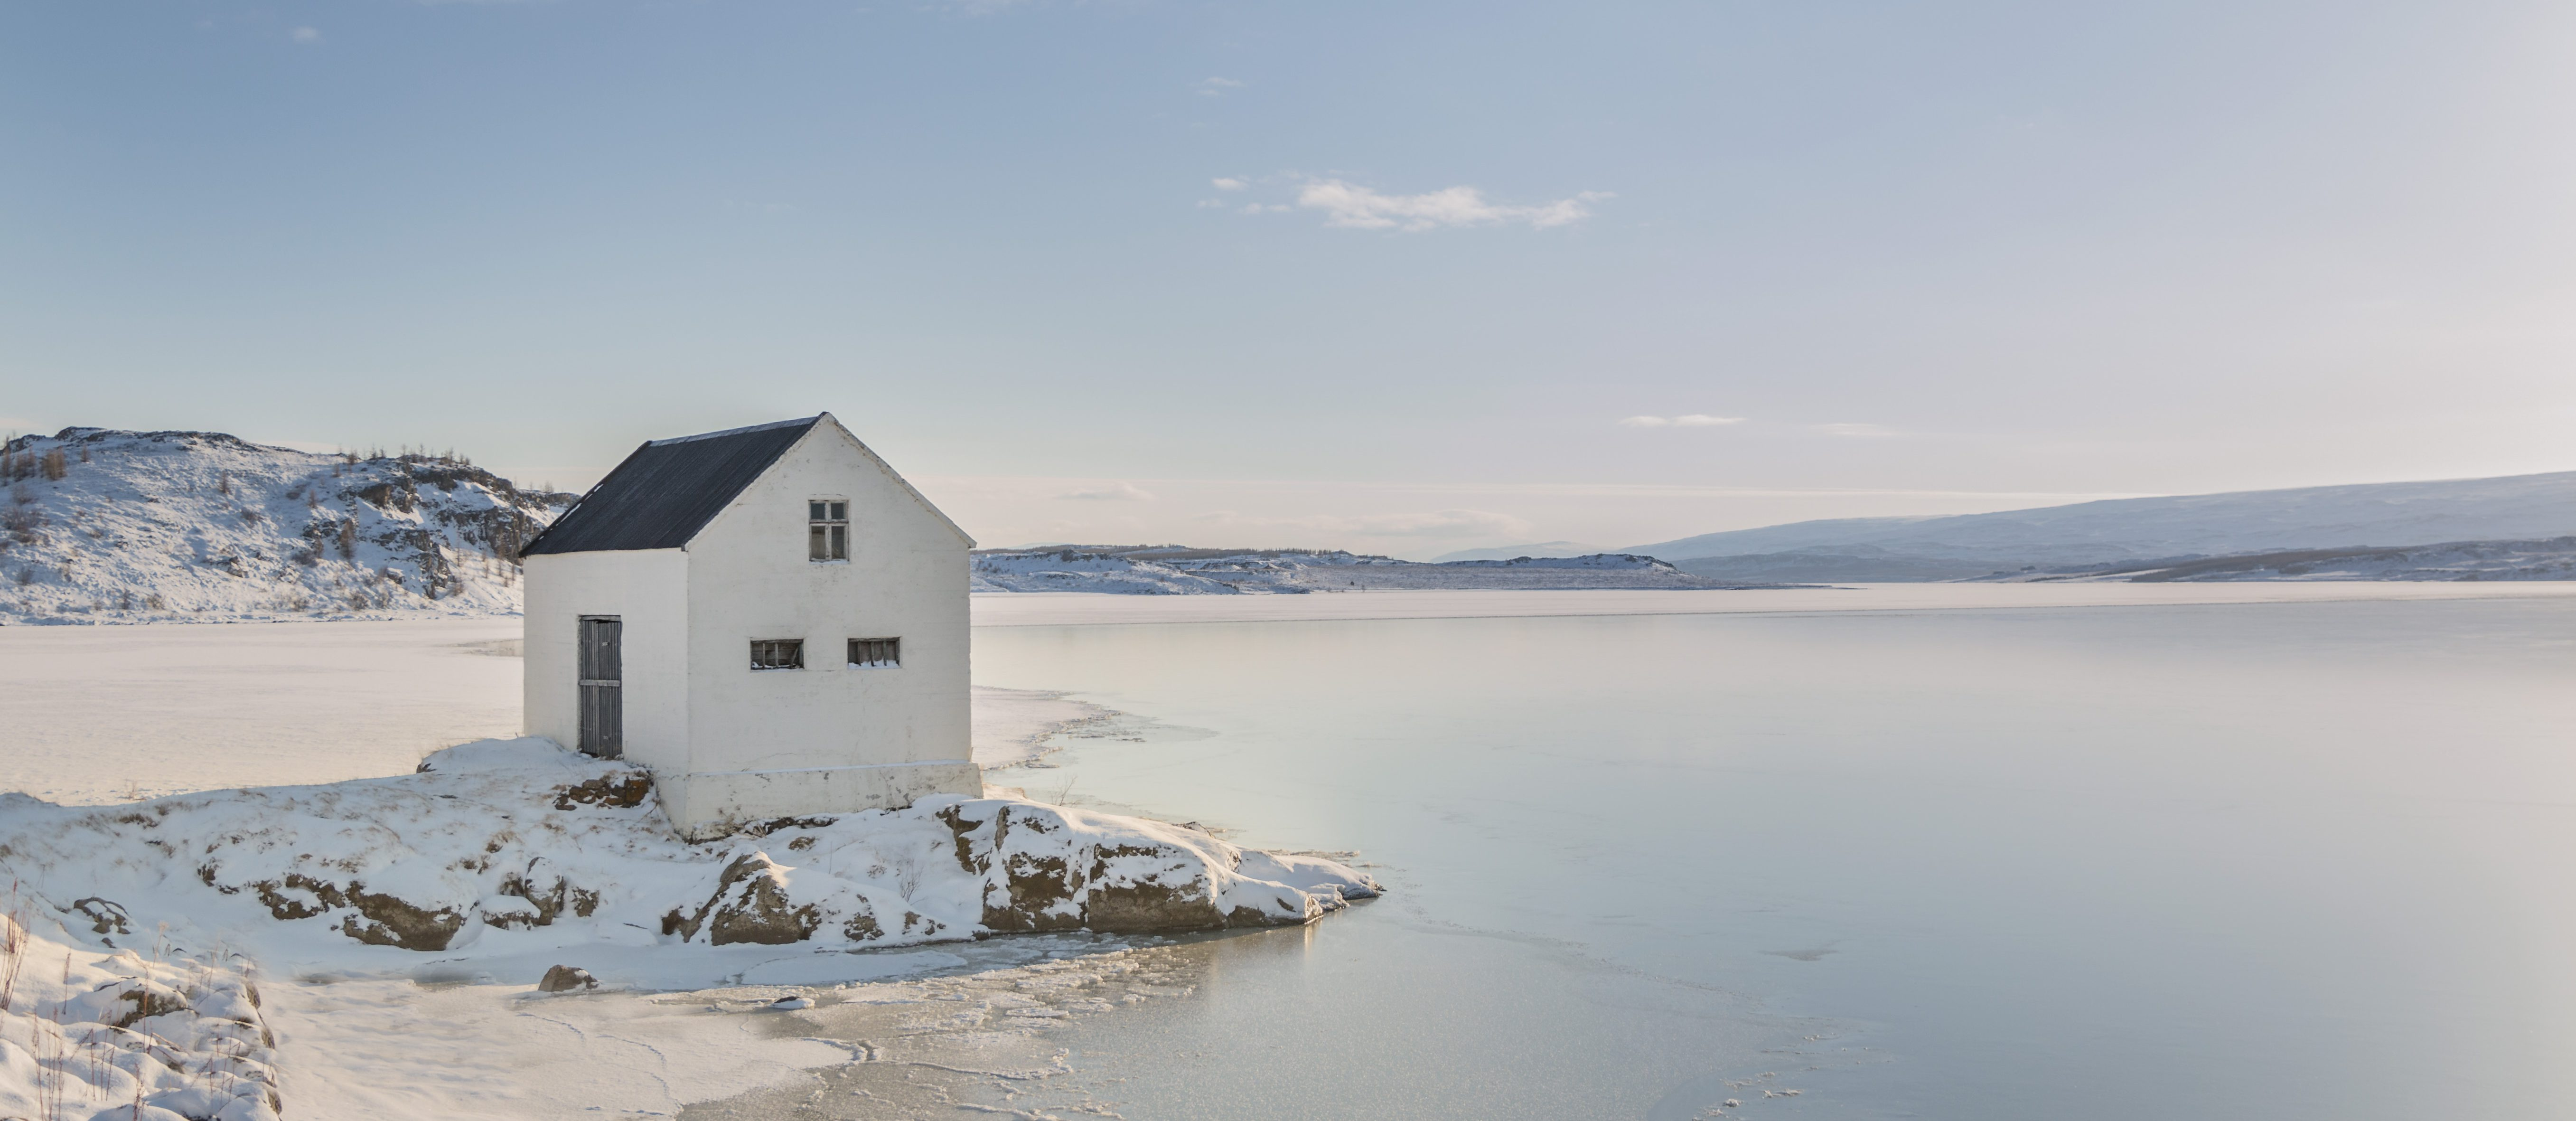 Winterlandschaft am See Lagarfljot in Ostisland